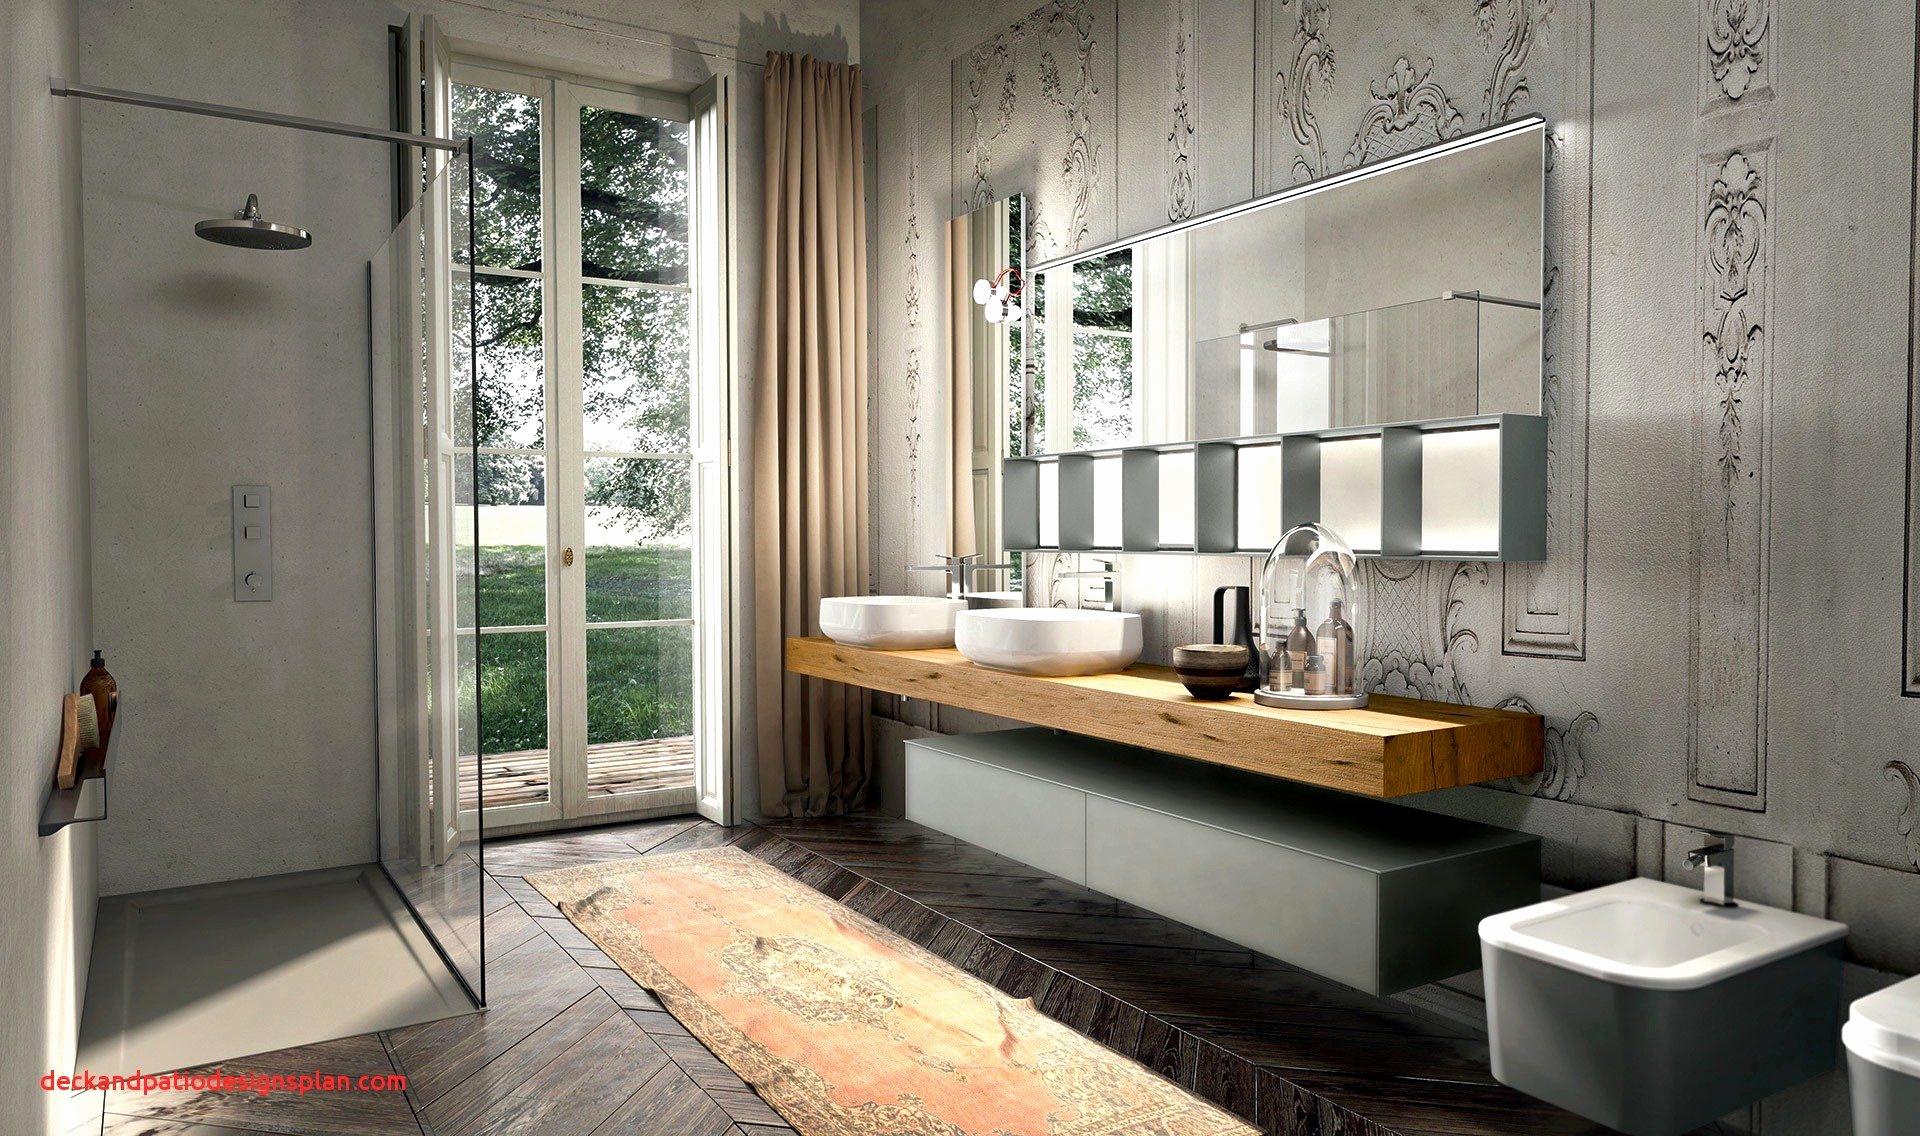 haus umbauen kosten neu bad renovieren kosten bilder kleine badezimmer kleine badezimmer 0d of haus umbauen kosten